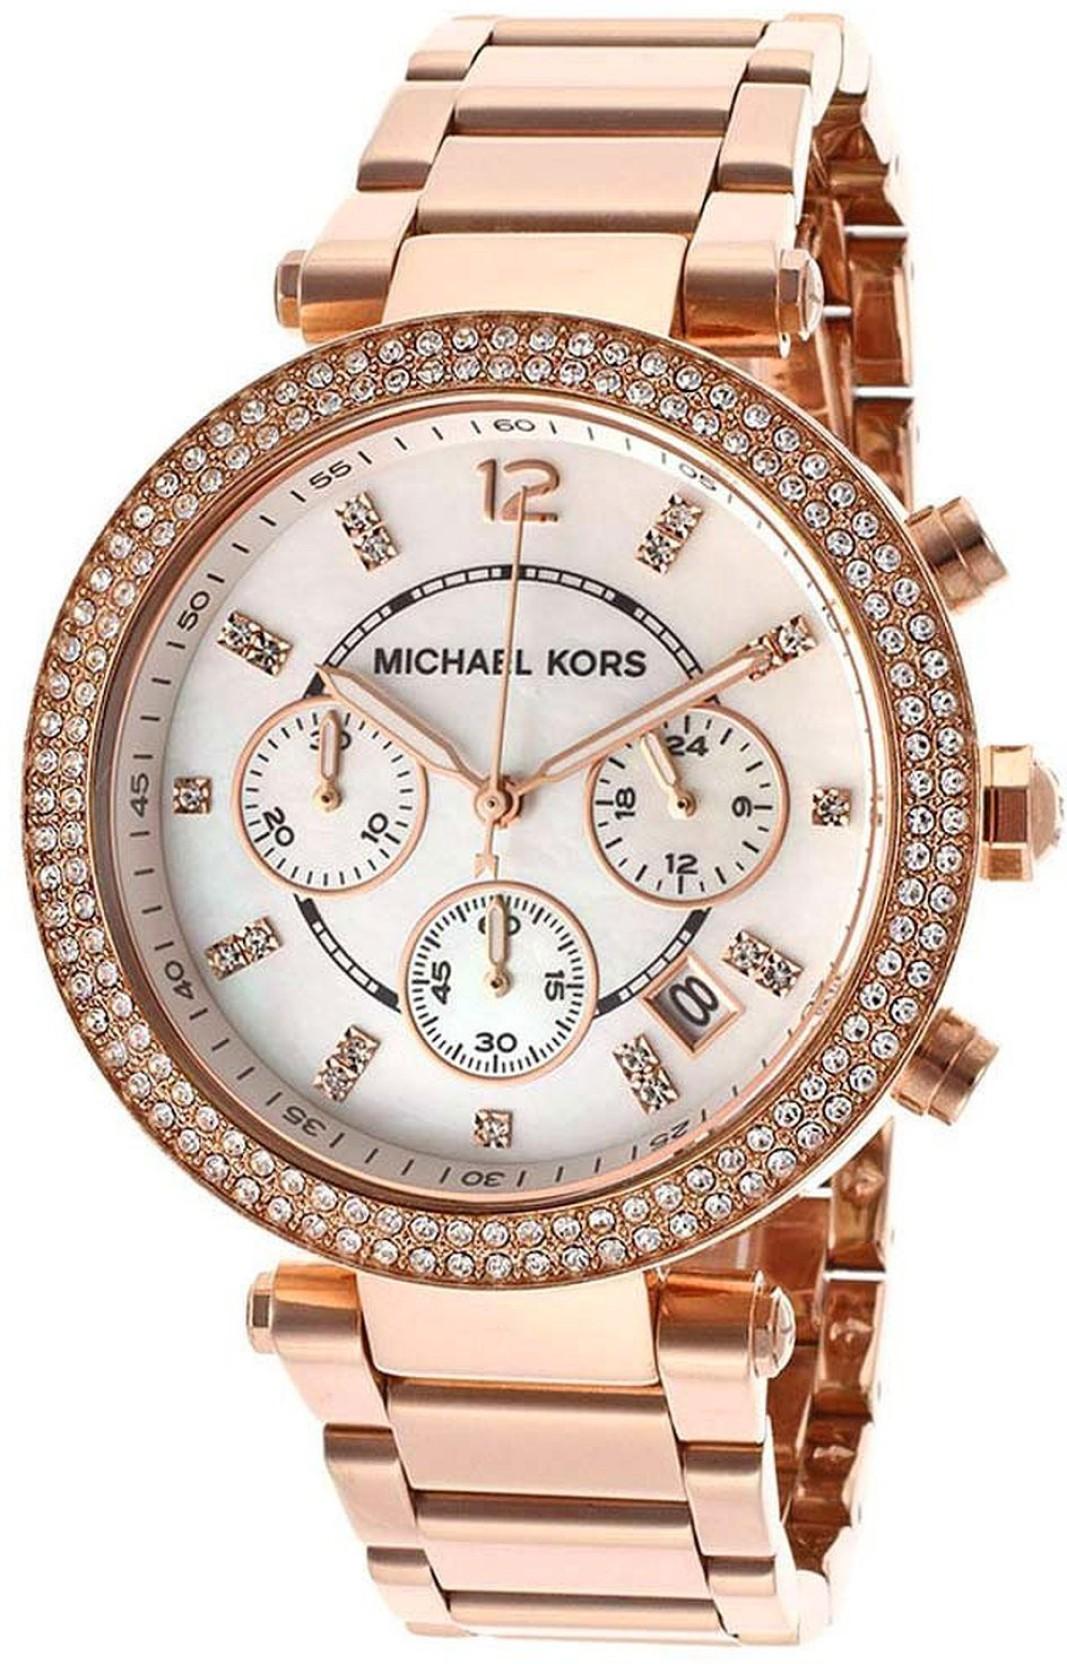 13d877465750 MK MICHAELKORS MK5491 Michael Kors Watch - For Women - Buy MK ...